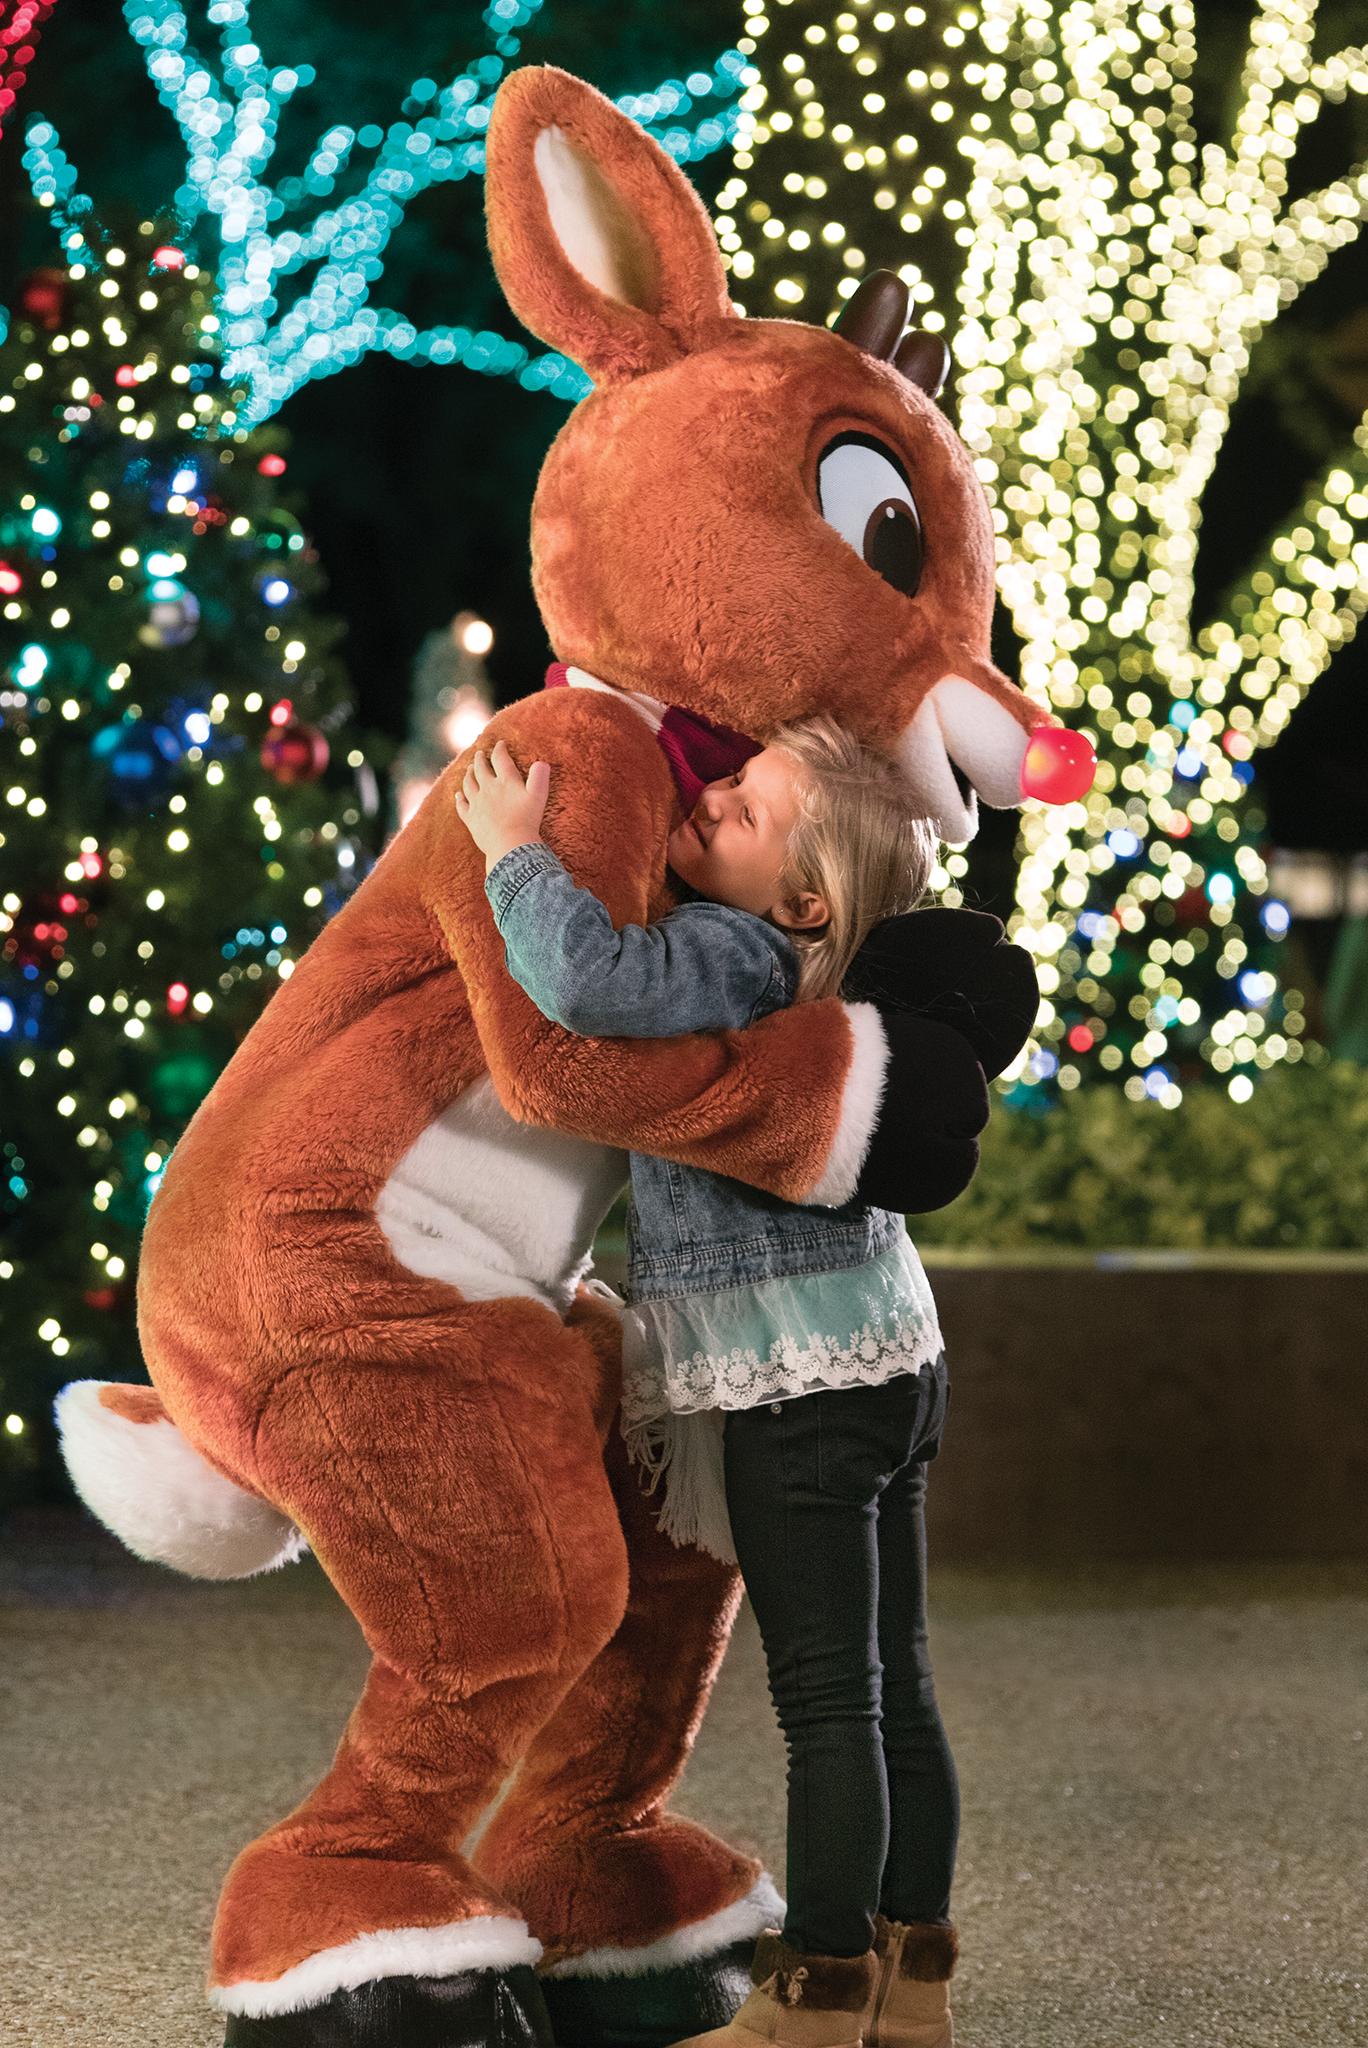 meet rudolph the rednosed reindeer at seaworld orlando's